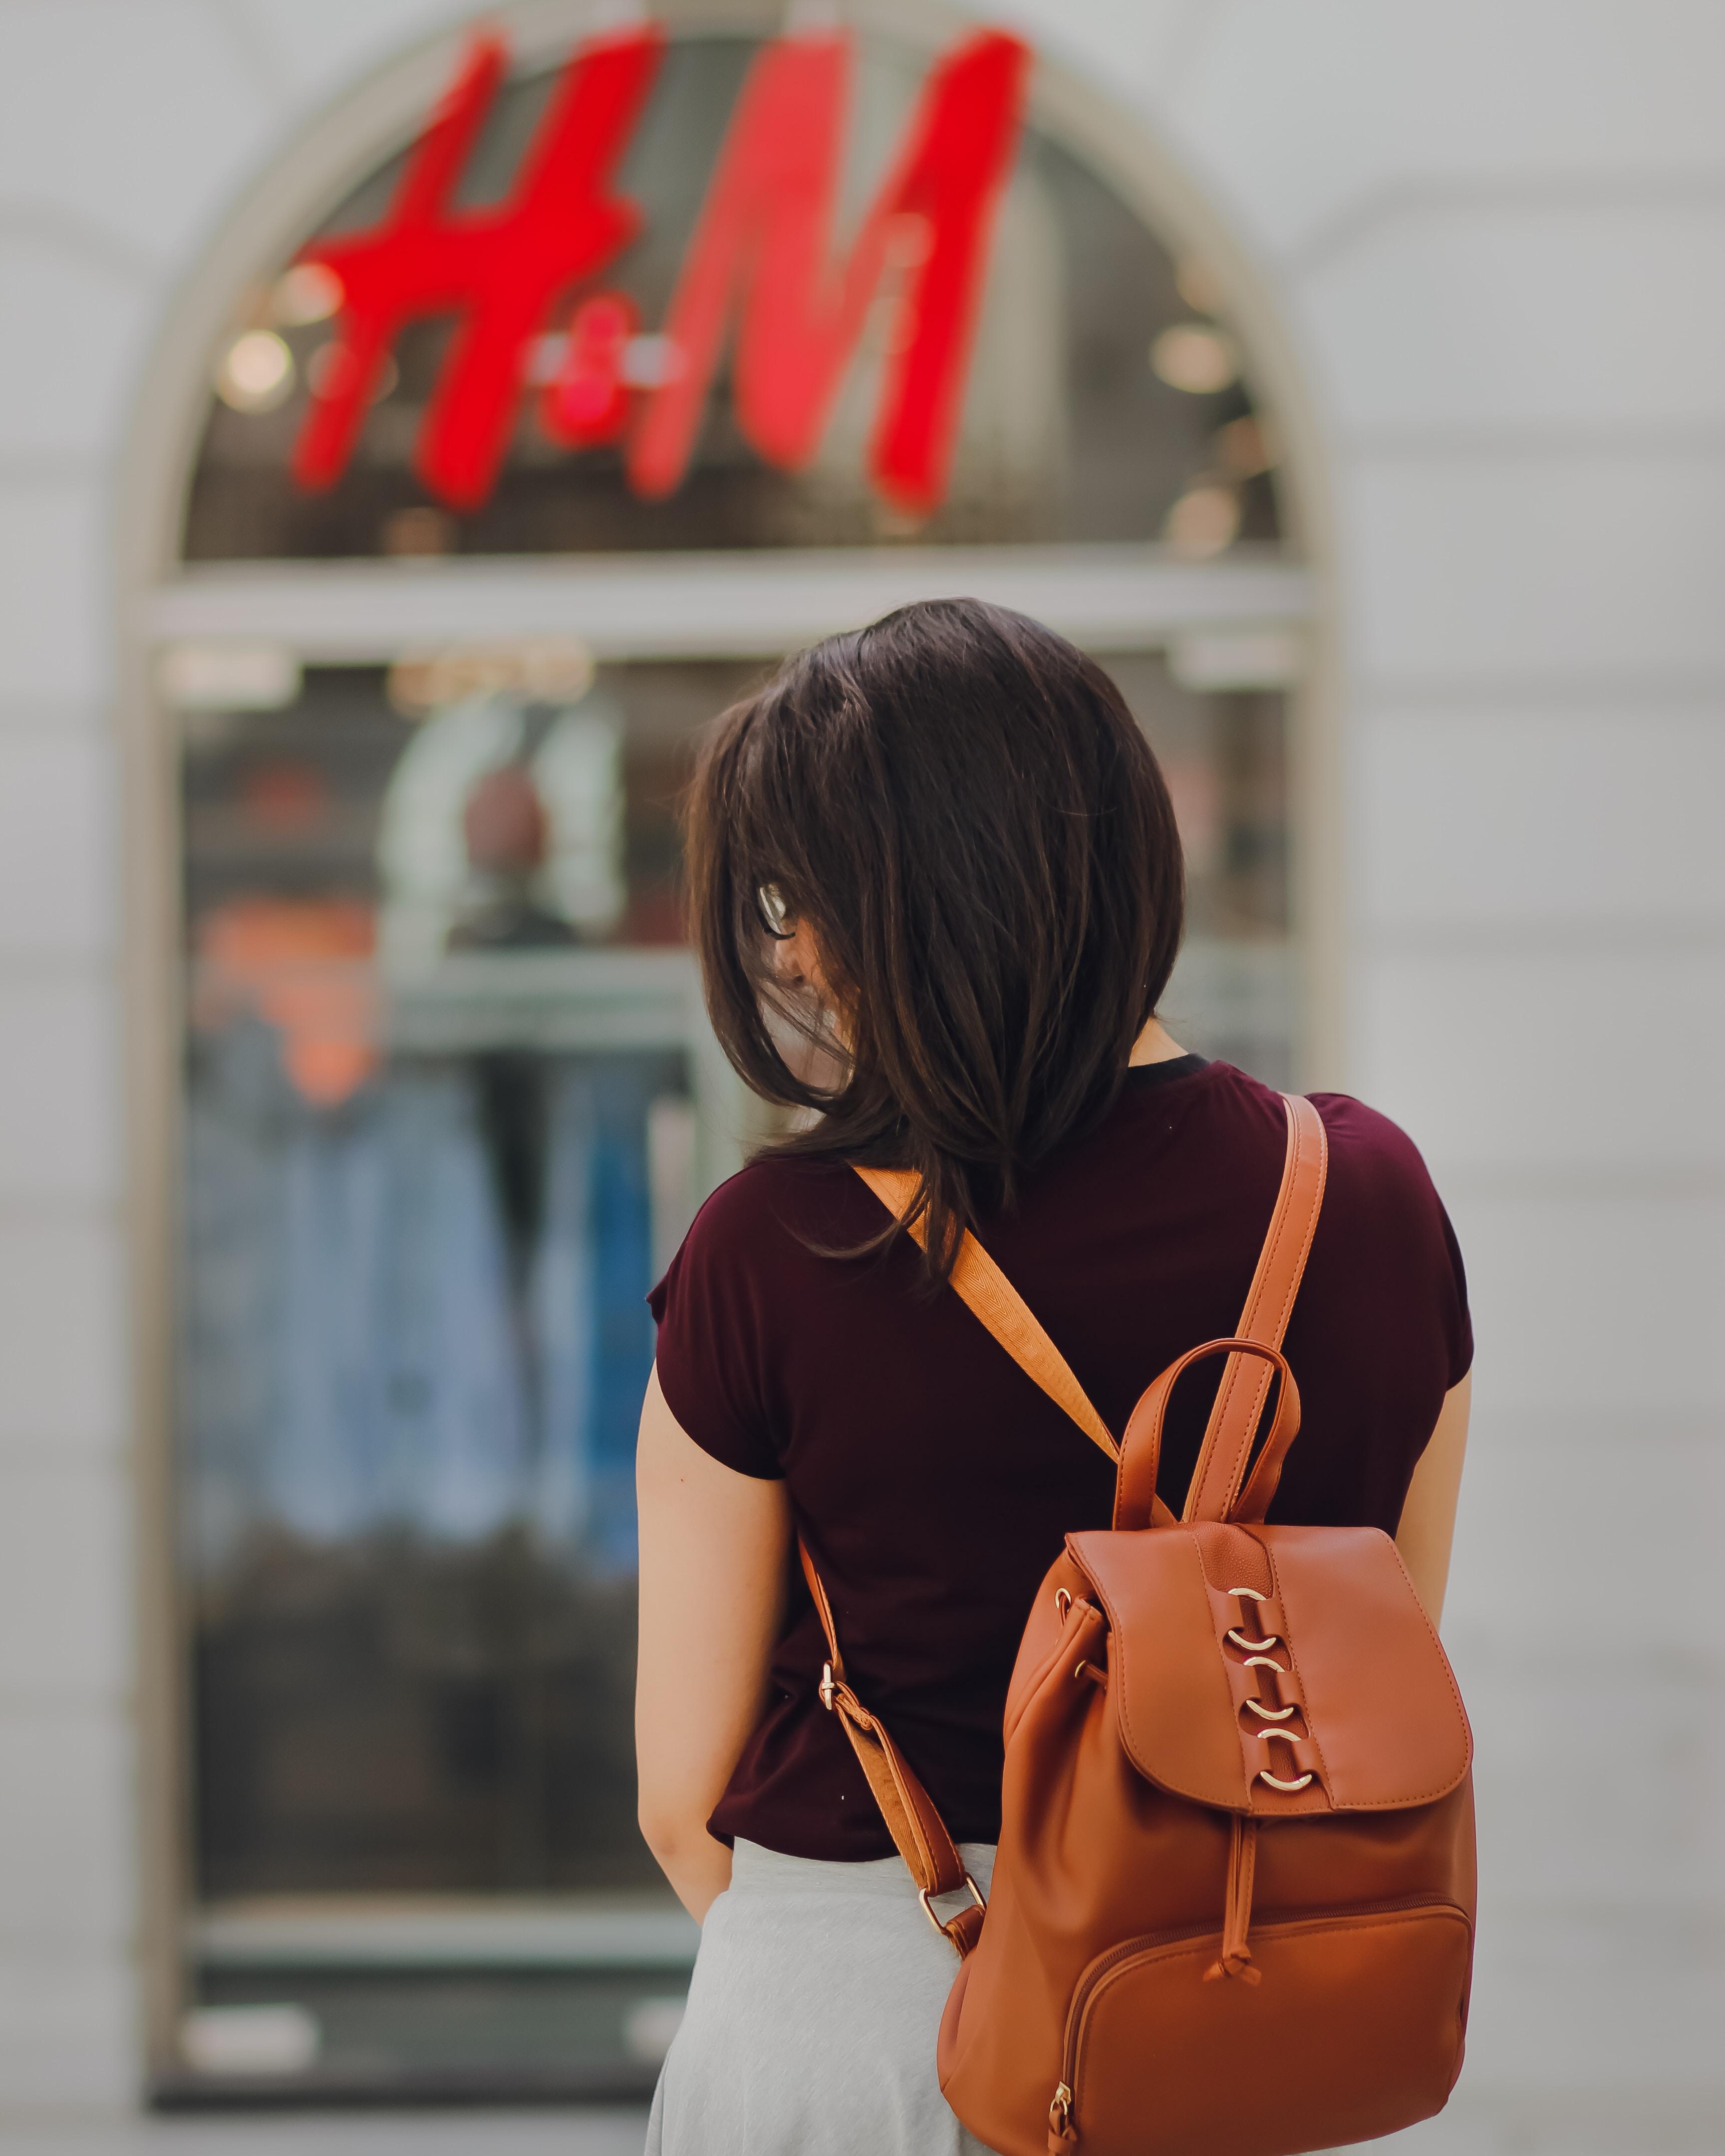 woman facing H&M store during daytime